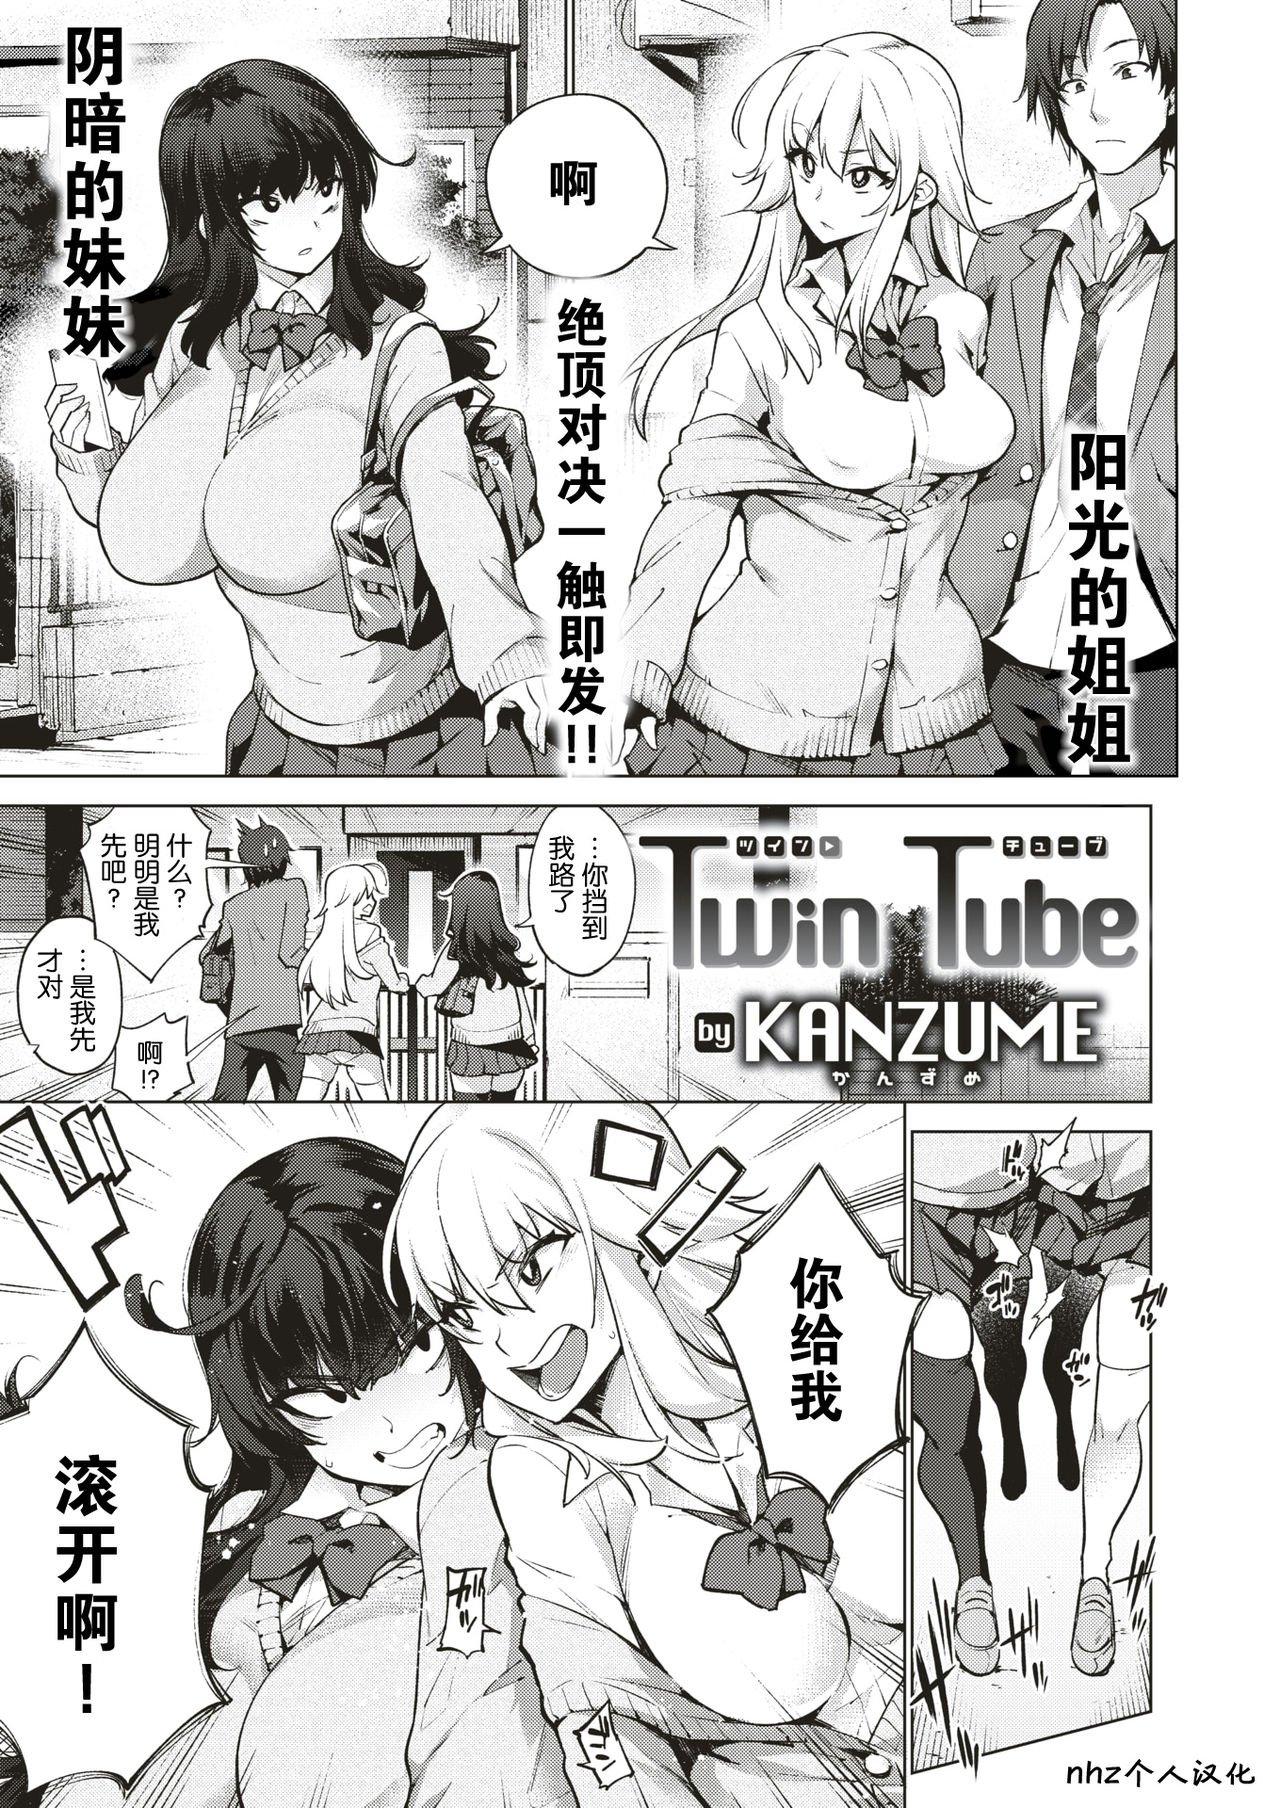 [KANZUME] Twin Tube - 情色卡漫 -